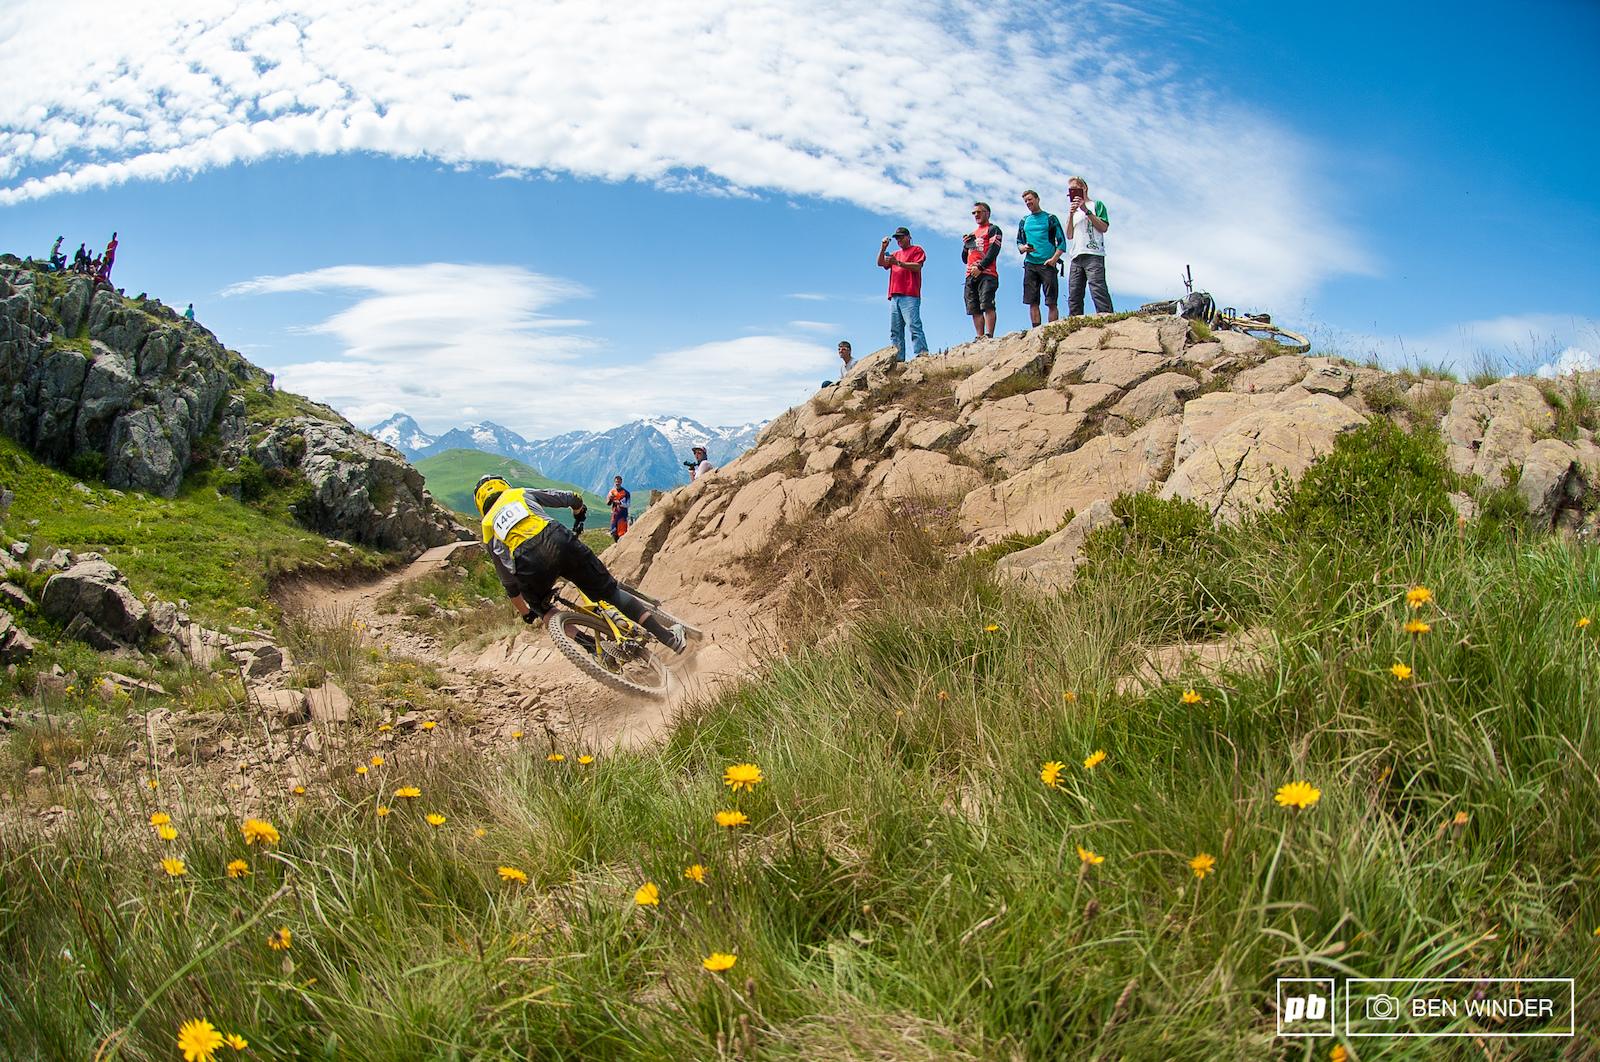 Nico Quere won his heat powering through this super fun bit of trail.